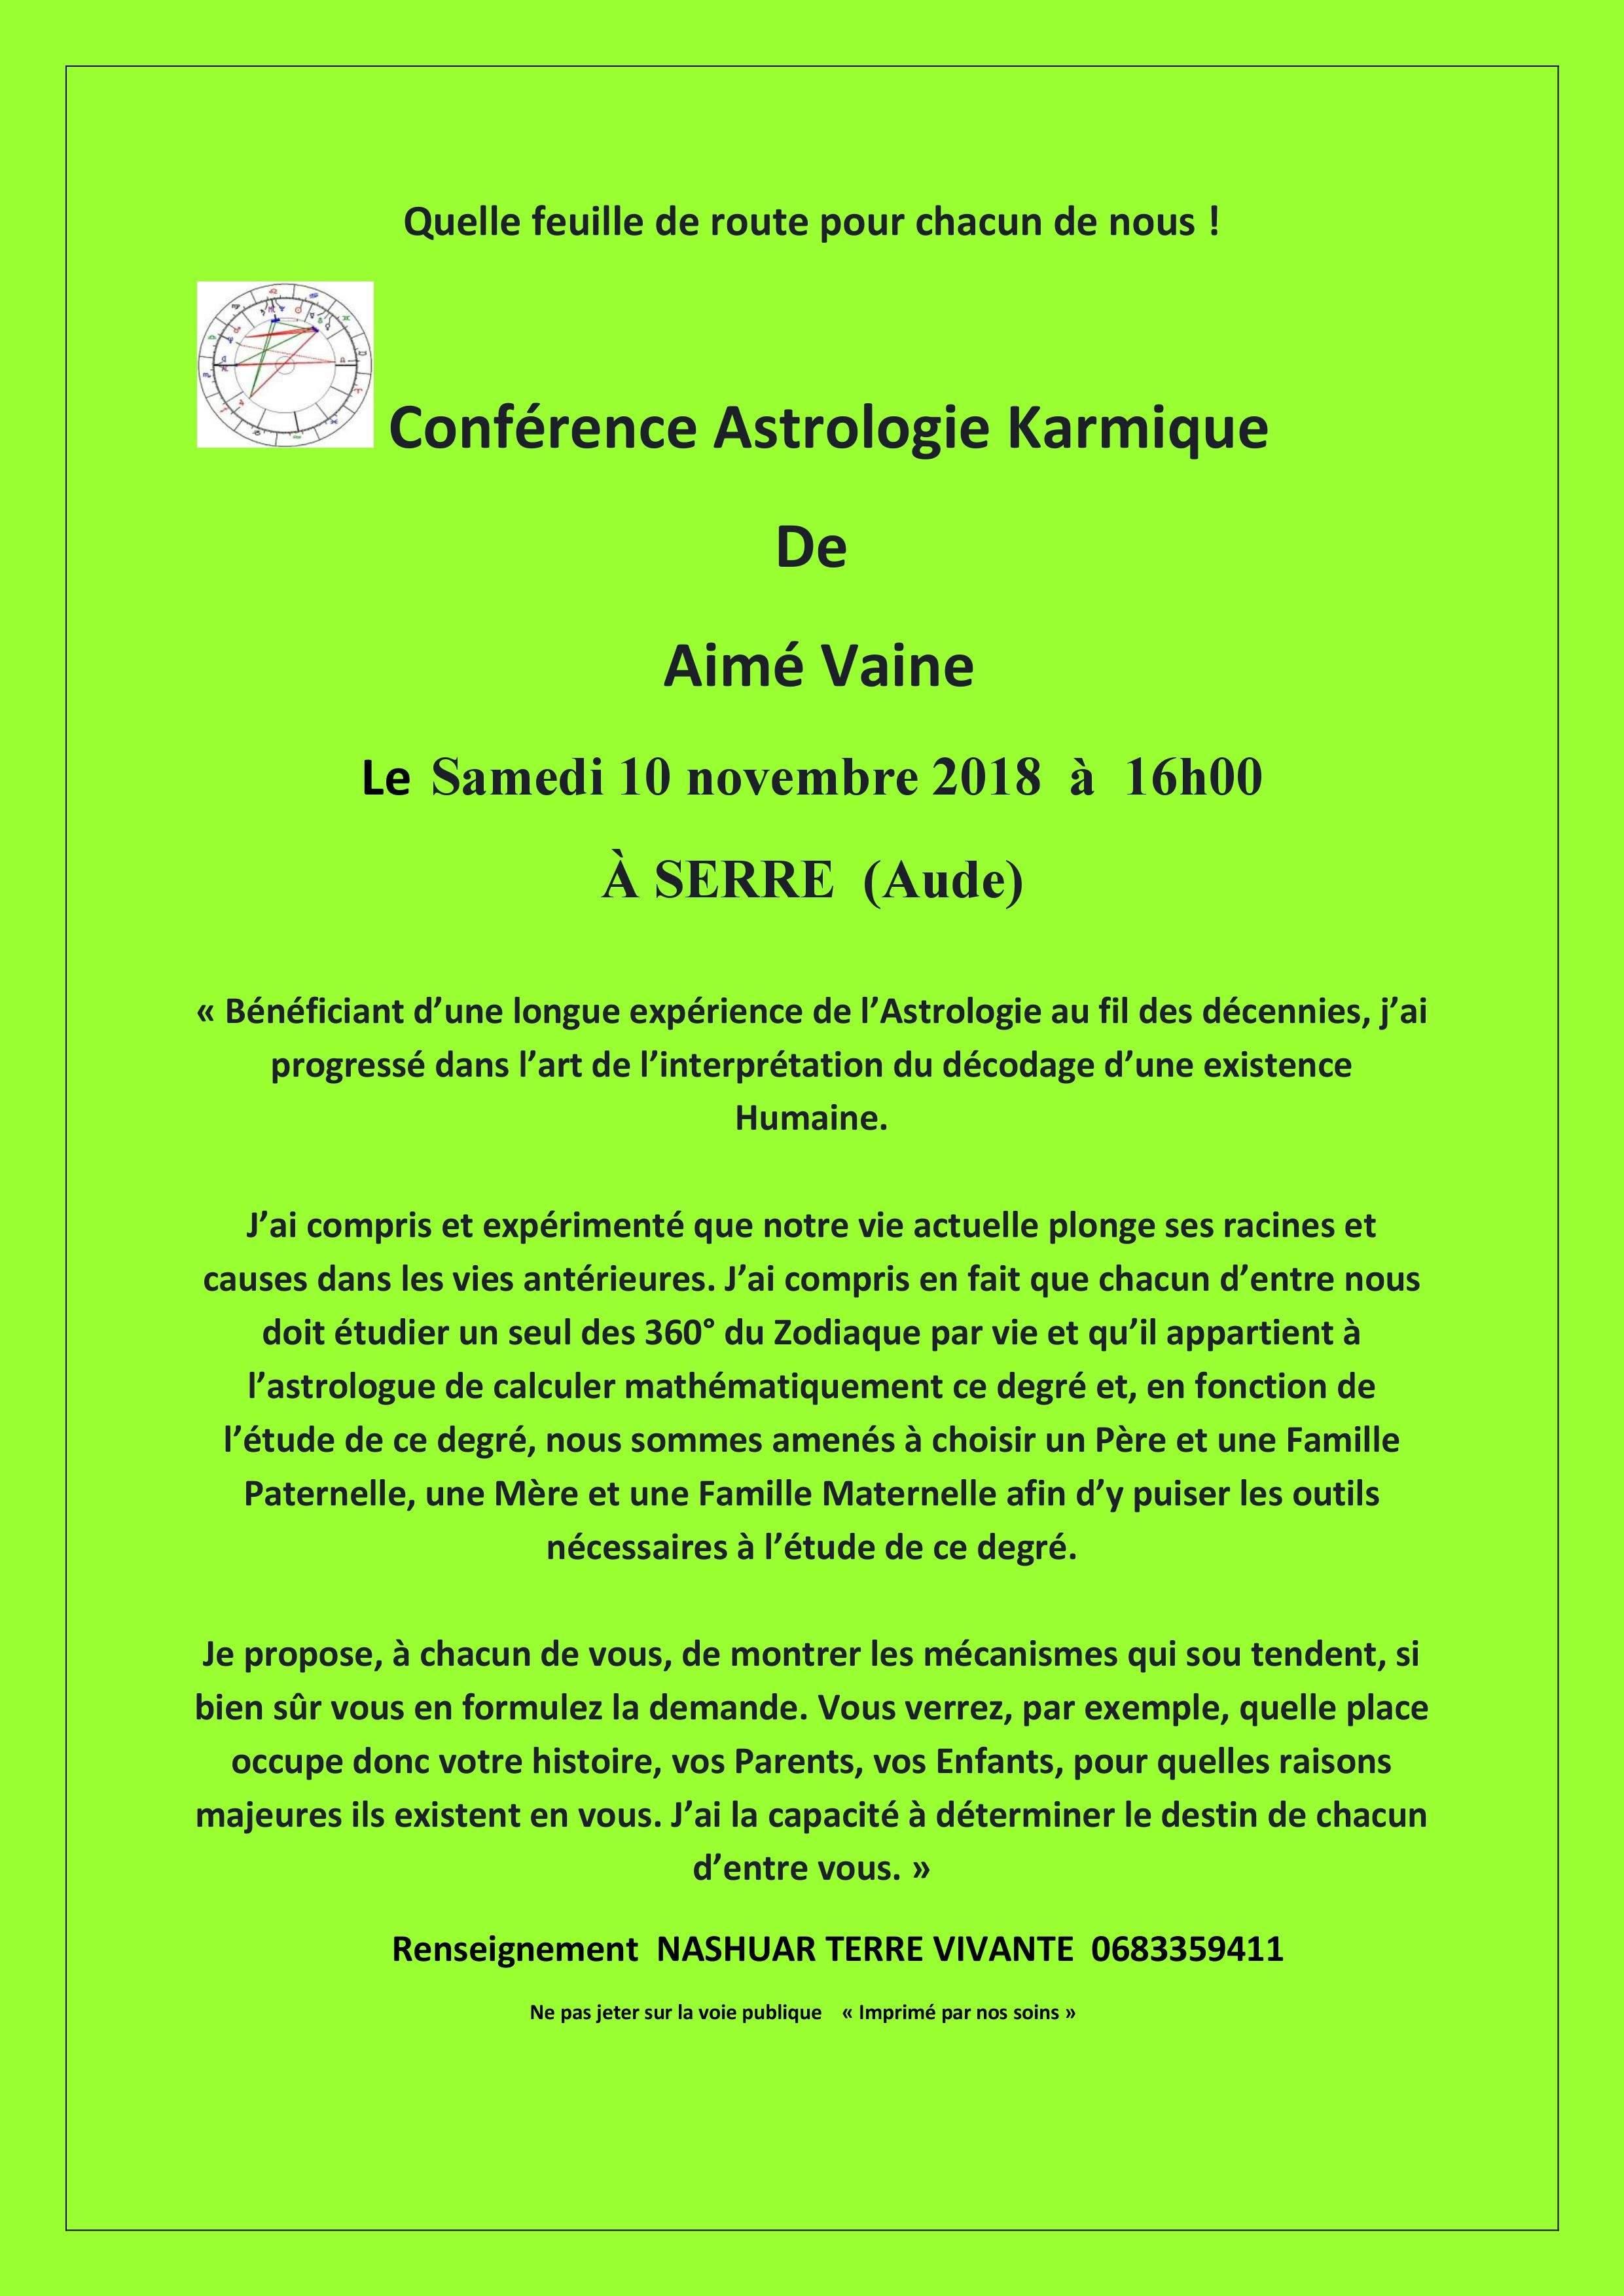 Conférence Astrologie Karmique